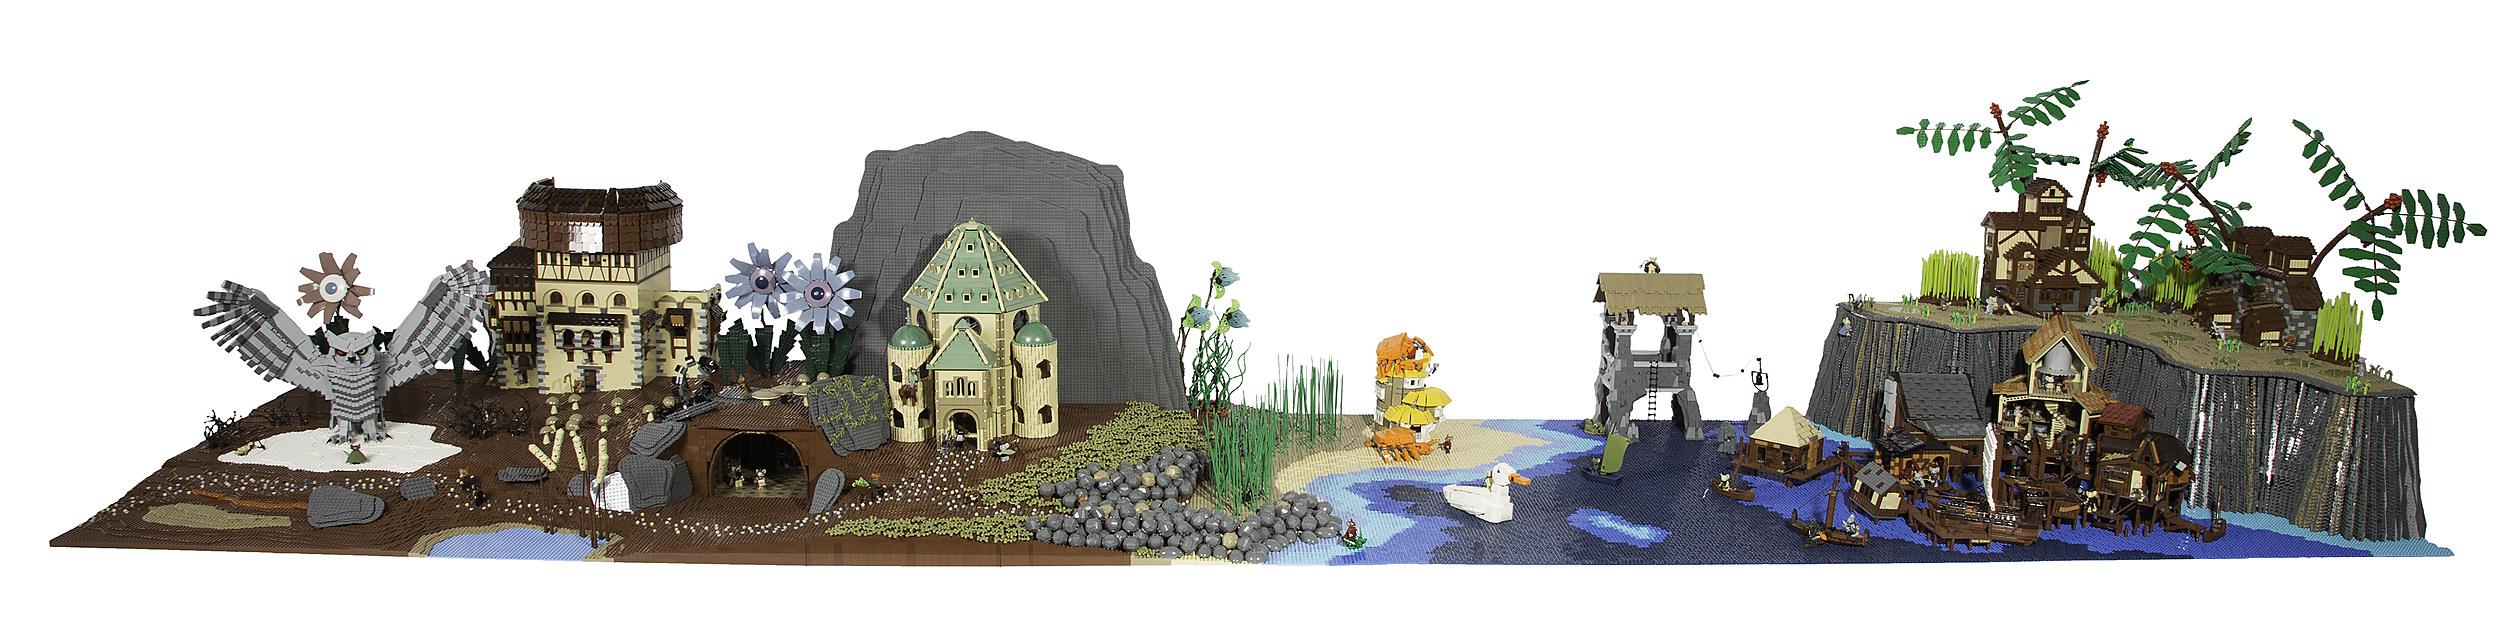 Mouse Guard_Art of Bricks_Sample Image 1